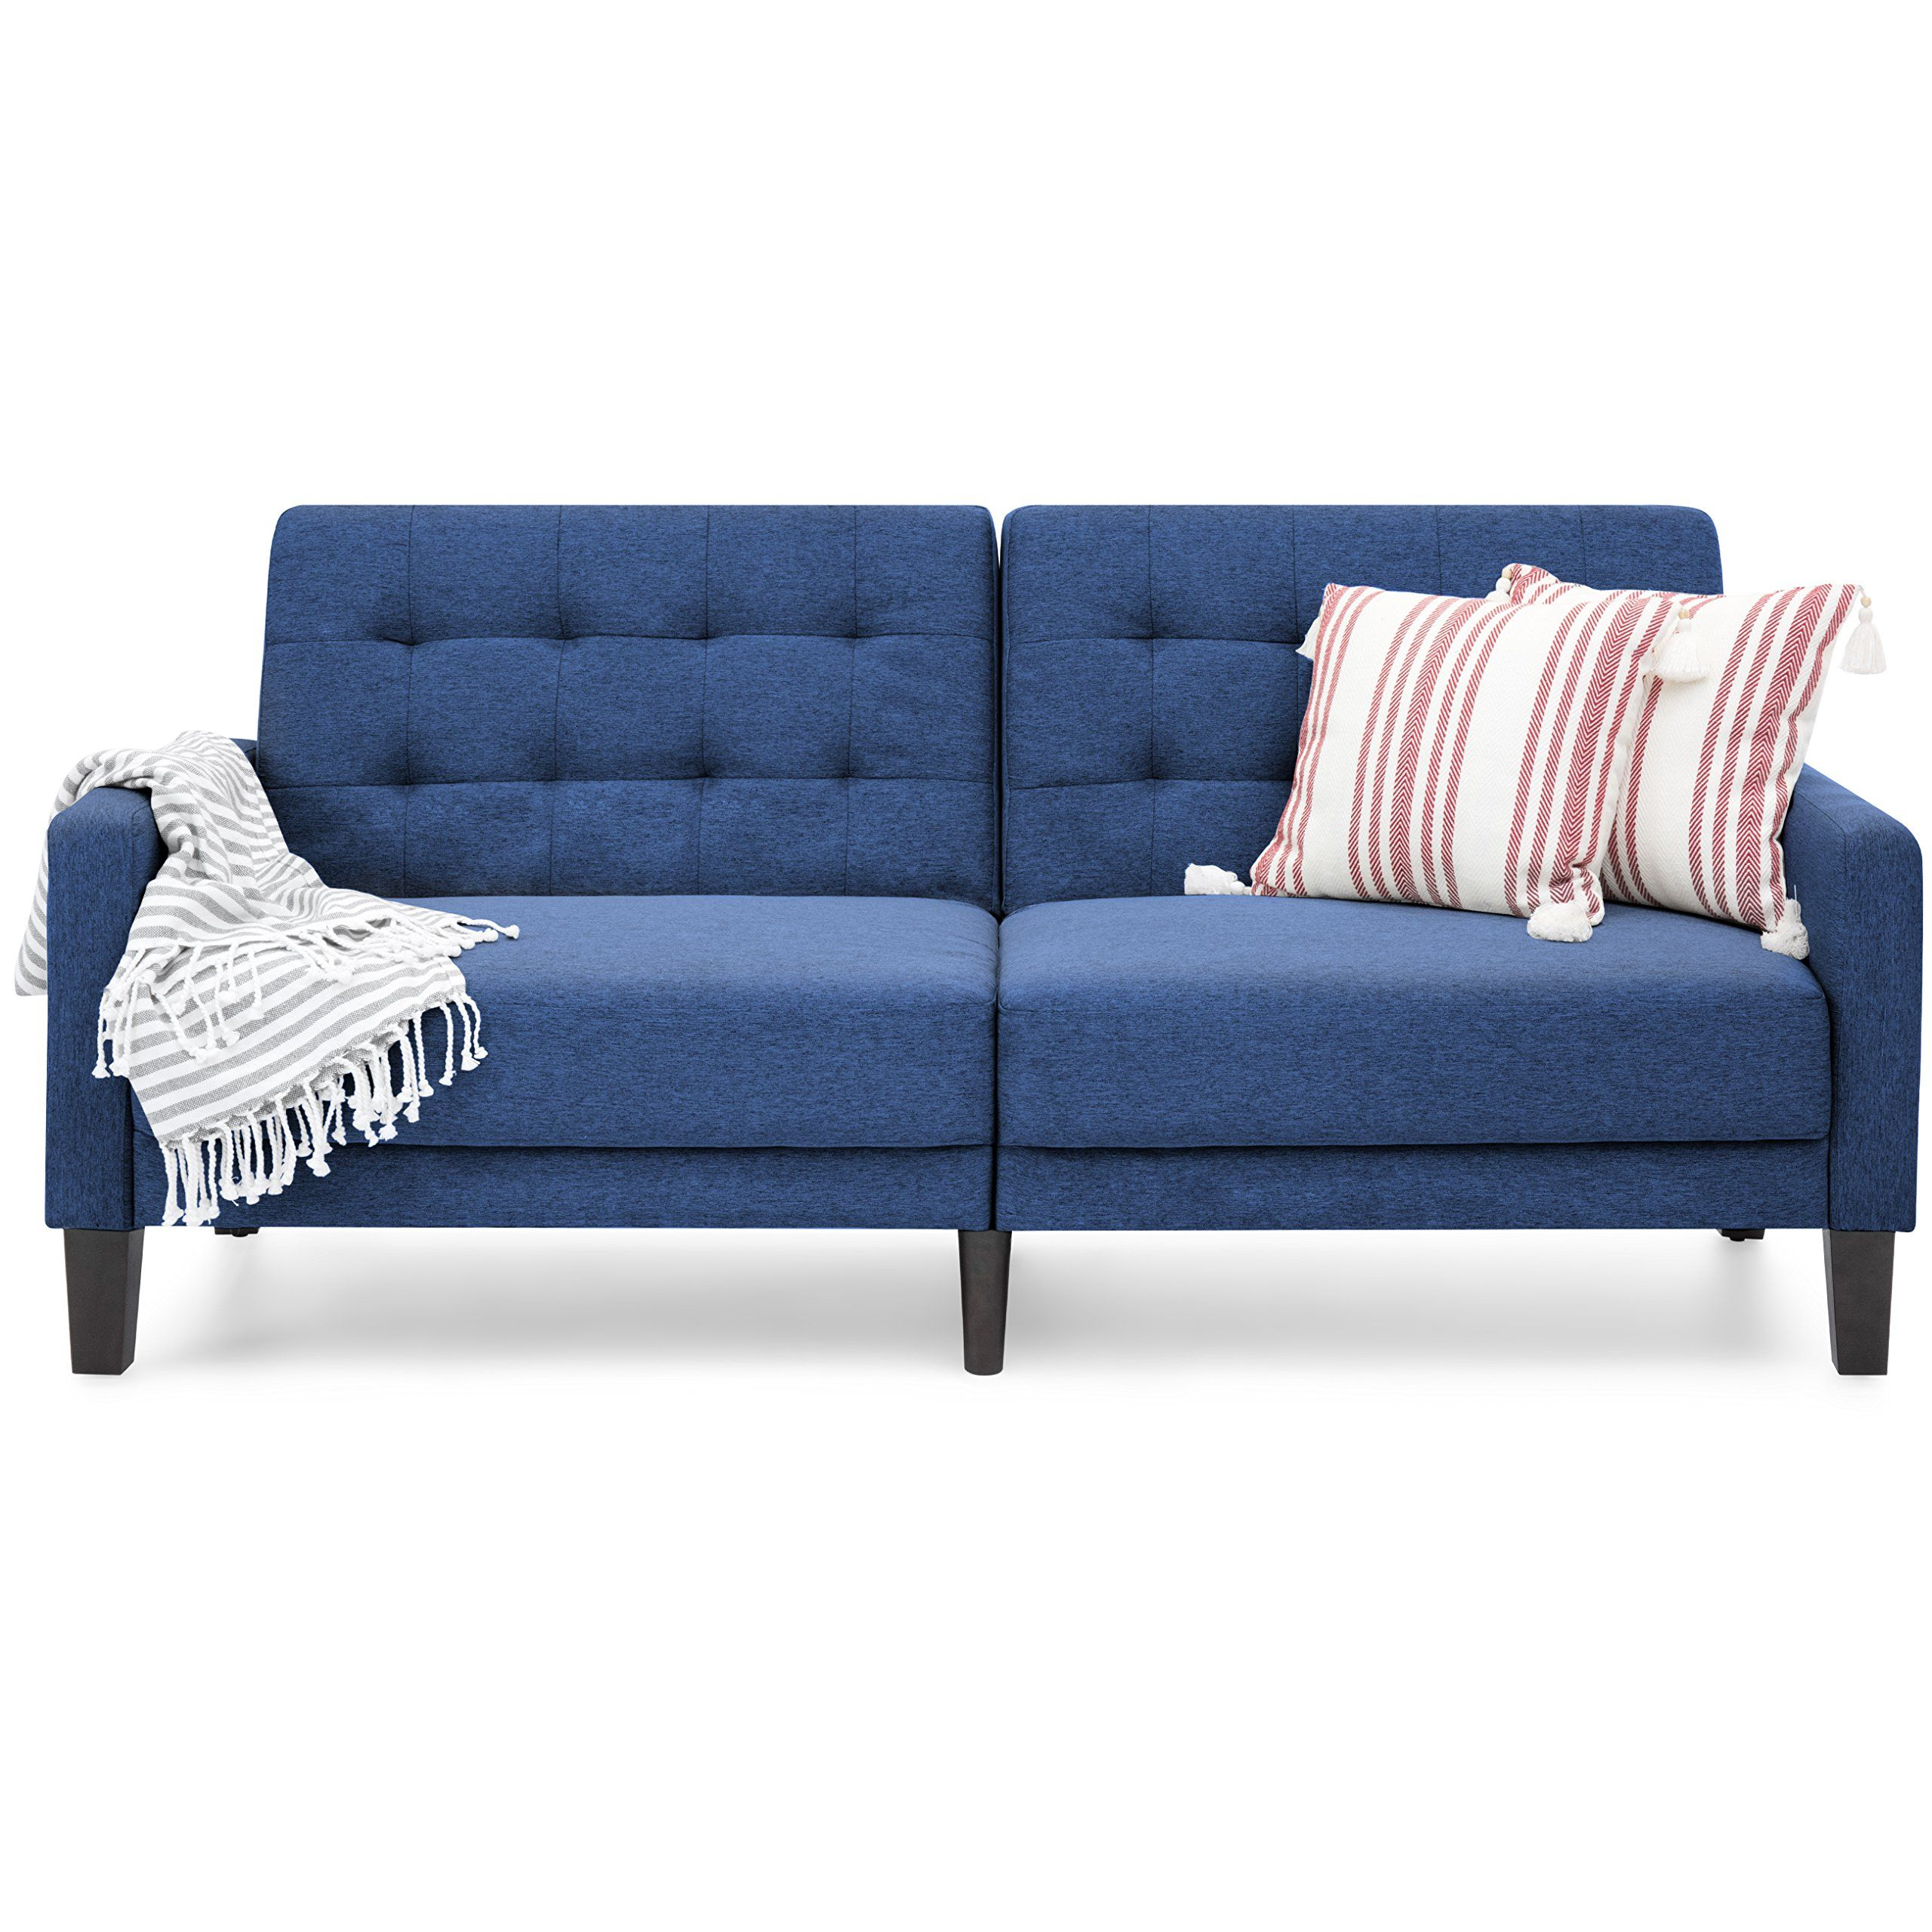 Linen Tufted Convertible Sofa Futon Sleeper Versatile Split Back Design Contemporary Style Space Saver Perfect Upholster Sofa Bed Furniture Apartment Size Sofa